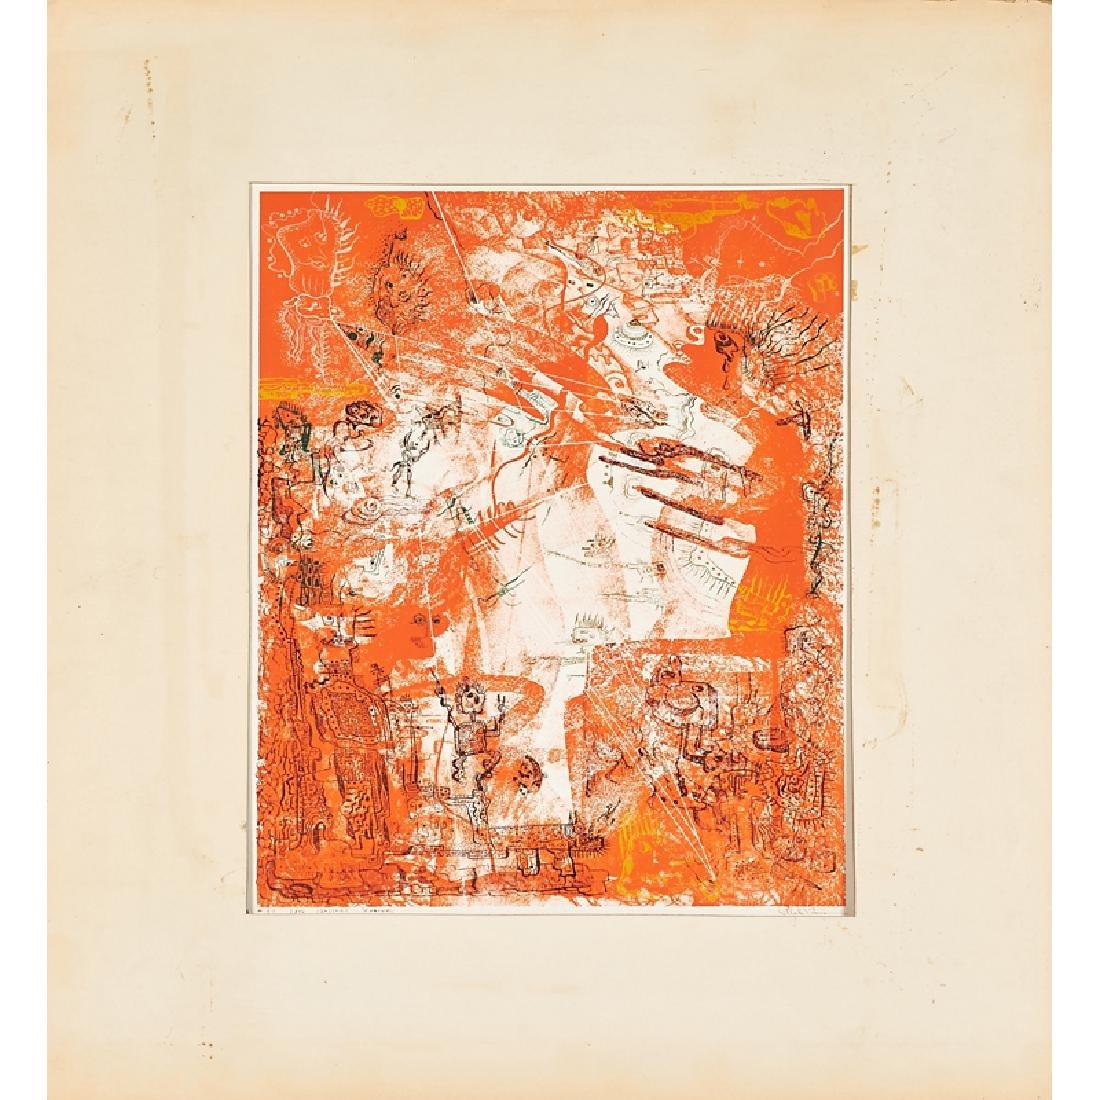 ROBERT VALE FARO (American, 1902-1988) - 9